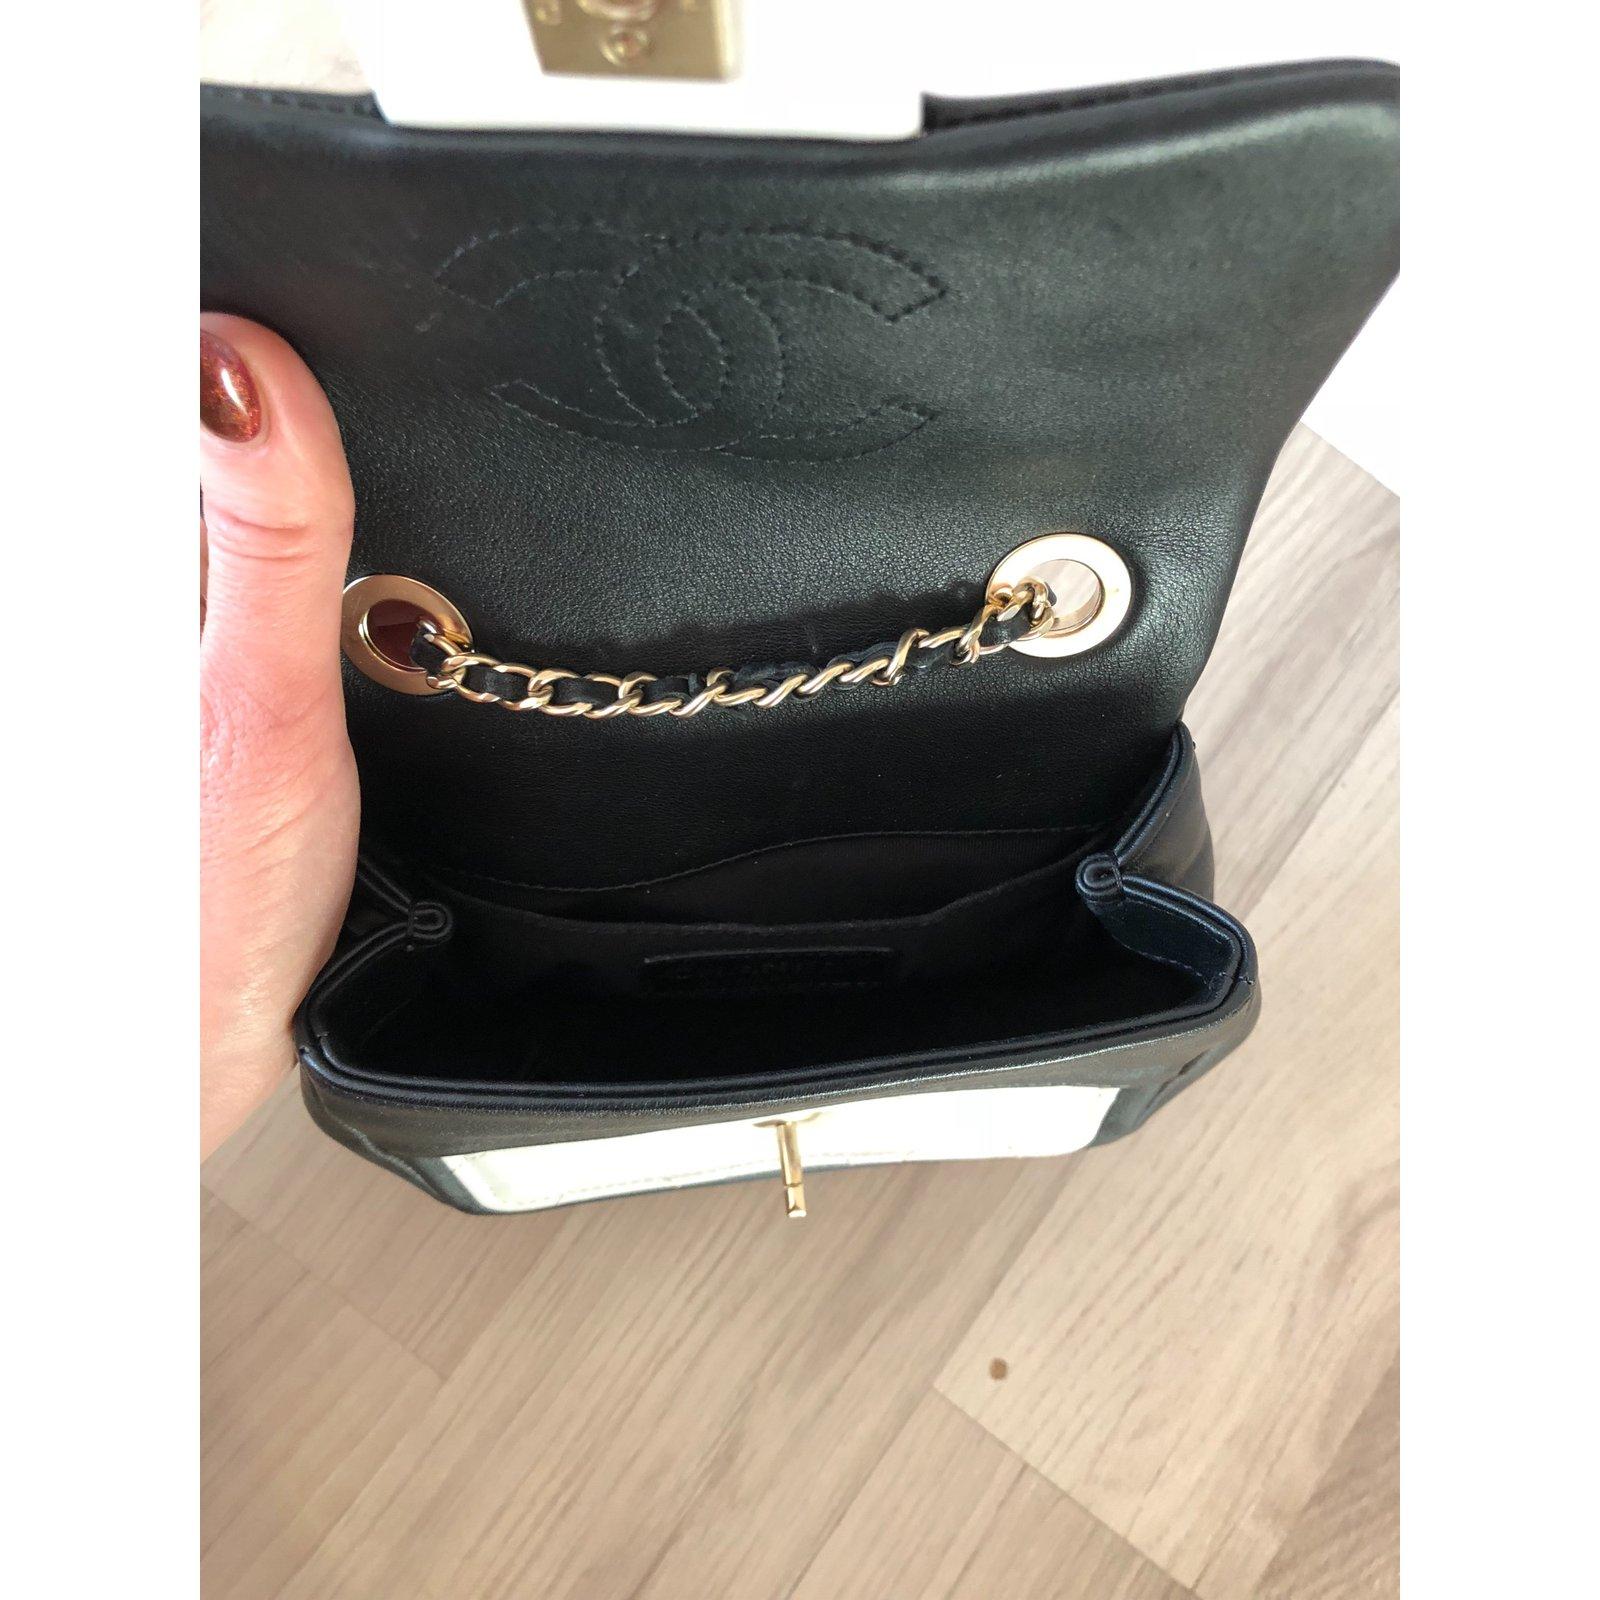 202a12212d0e Chanel Mini bag Handbags Leather Black ref.85060 - Joli Closet